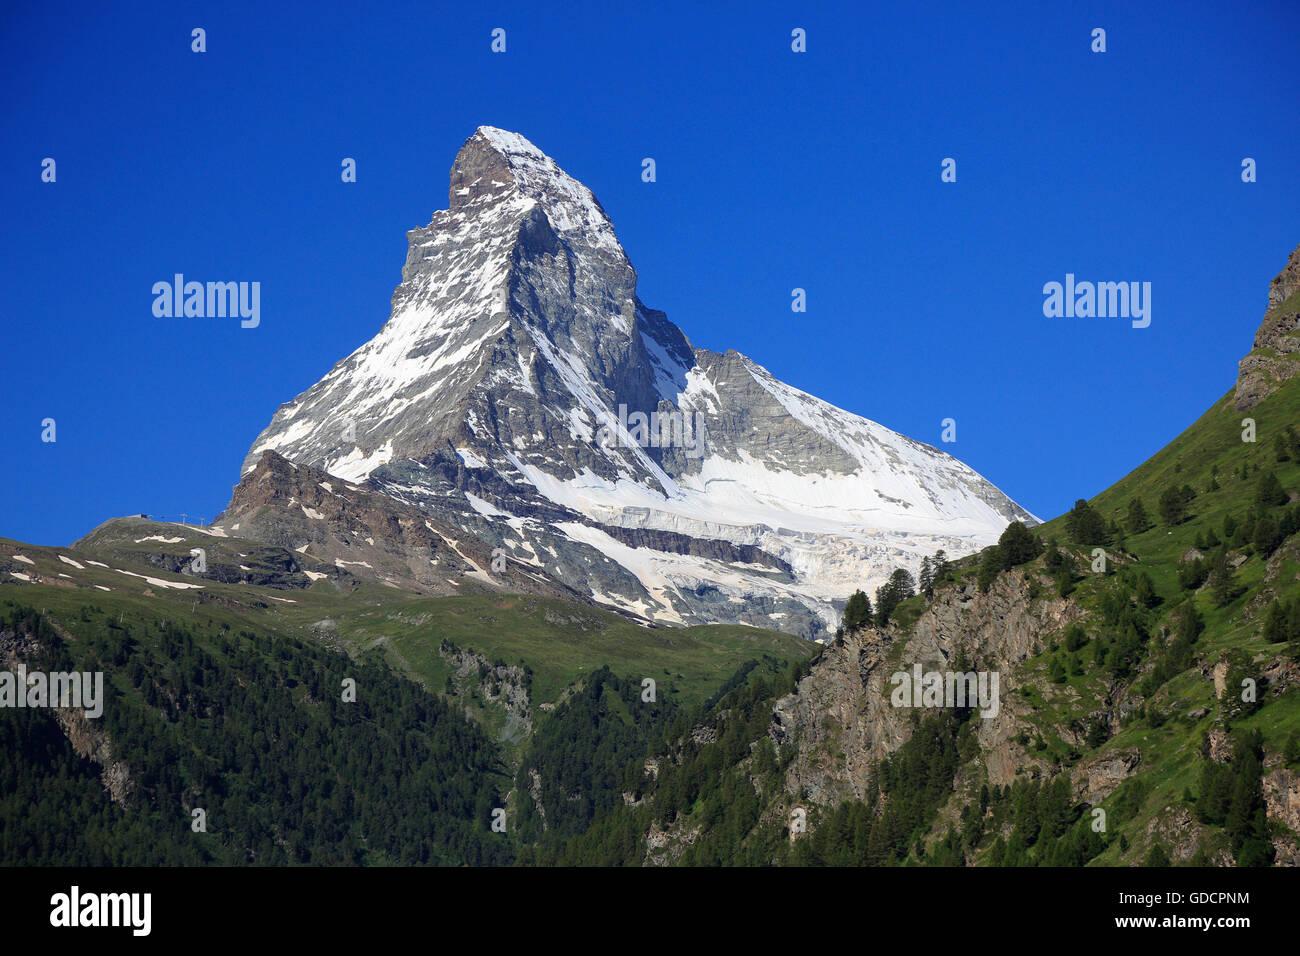 Matterhorn, Switzerland - Stock Image